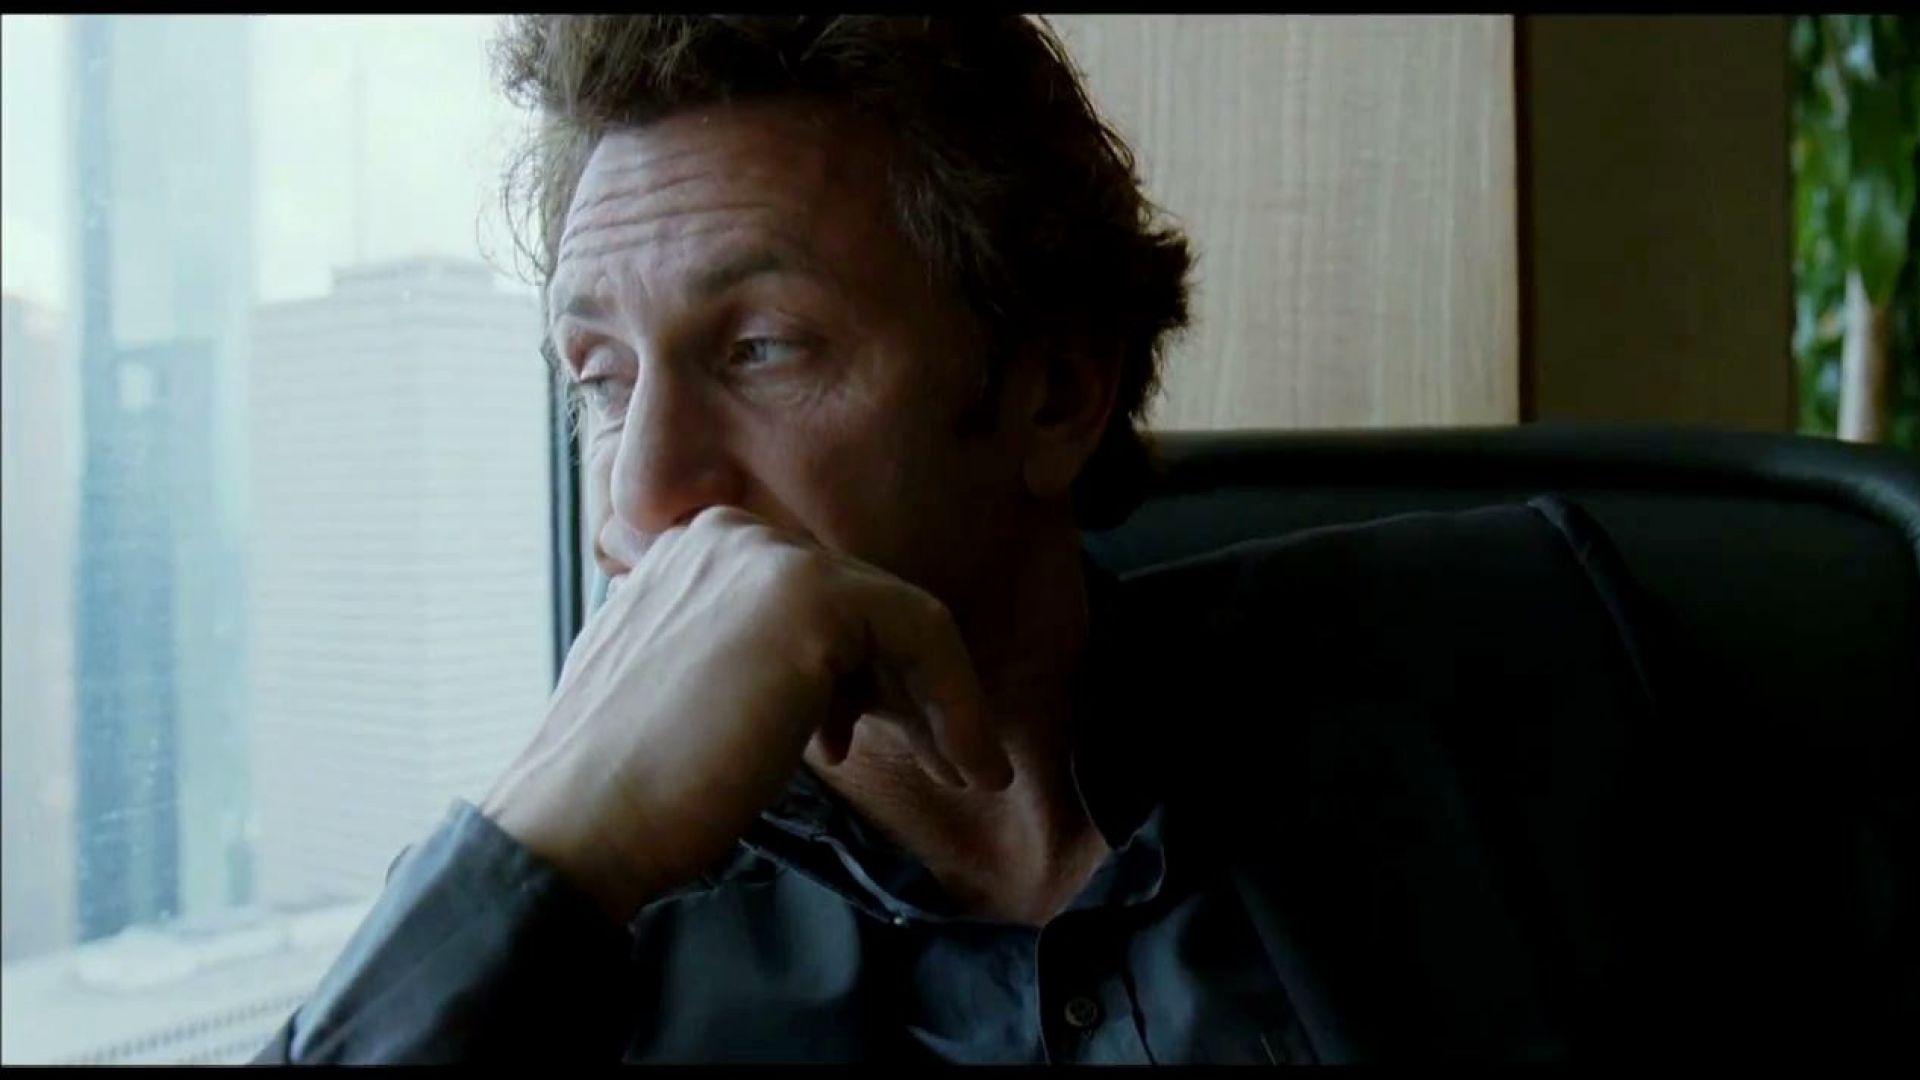 Sean Penn as Jack in The Tree of Life